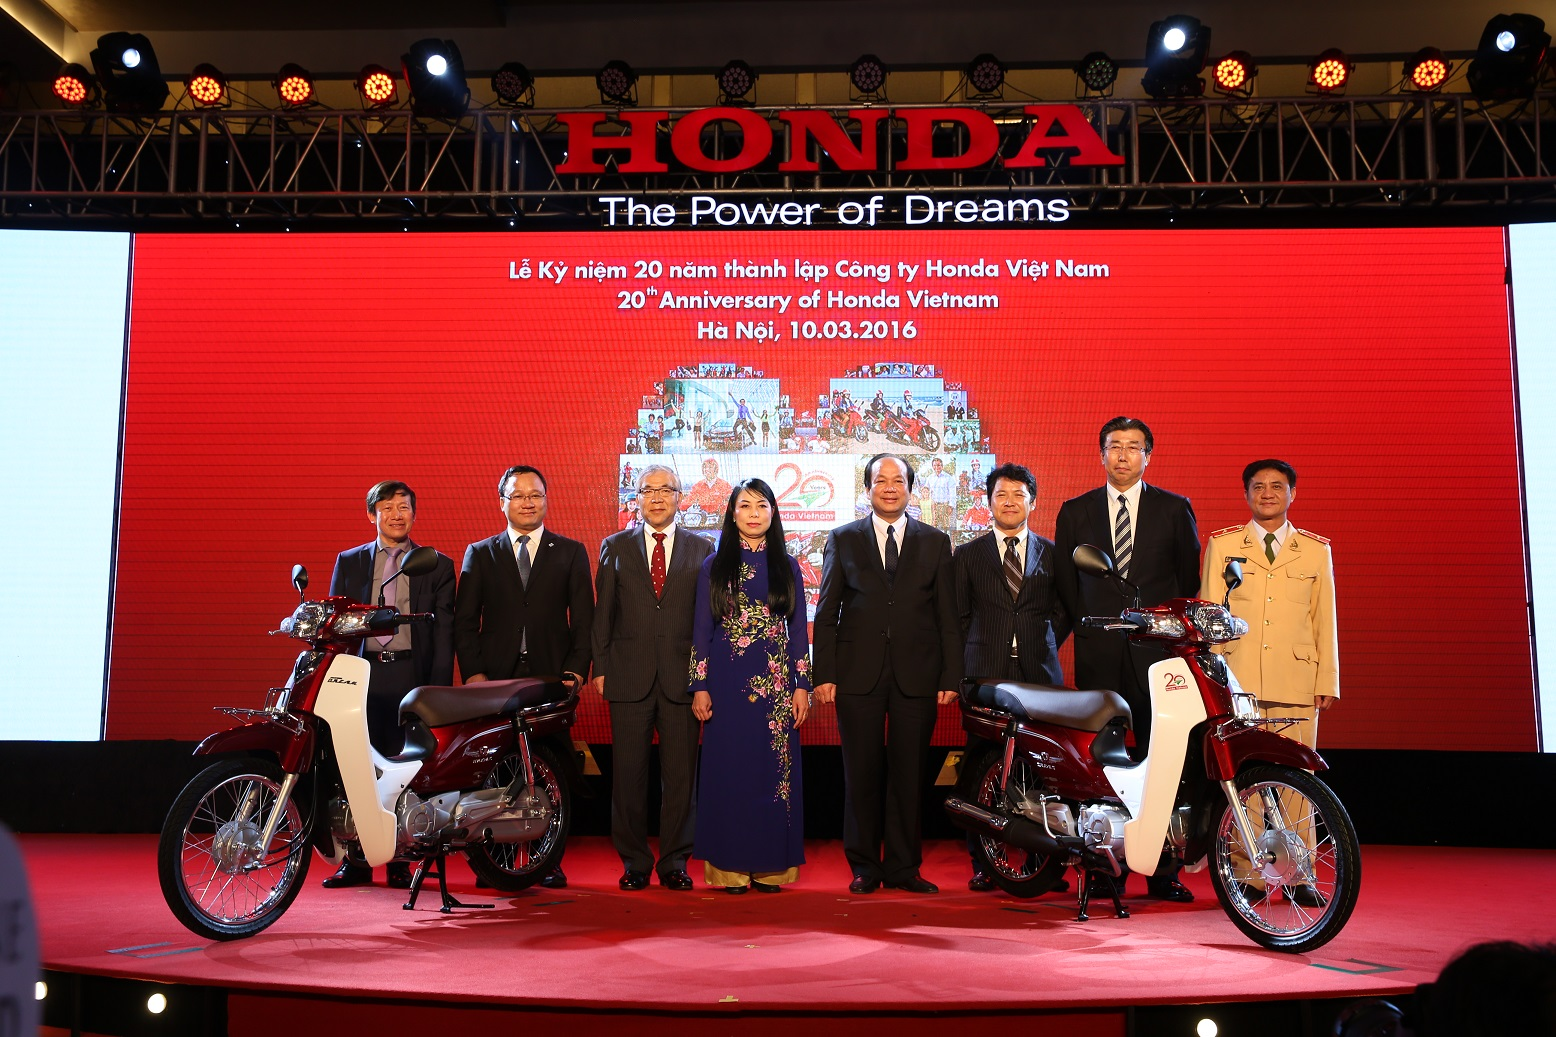 Honda Viet Nam